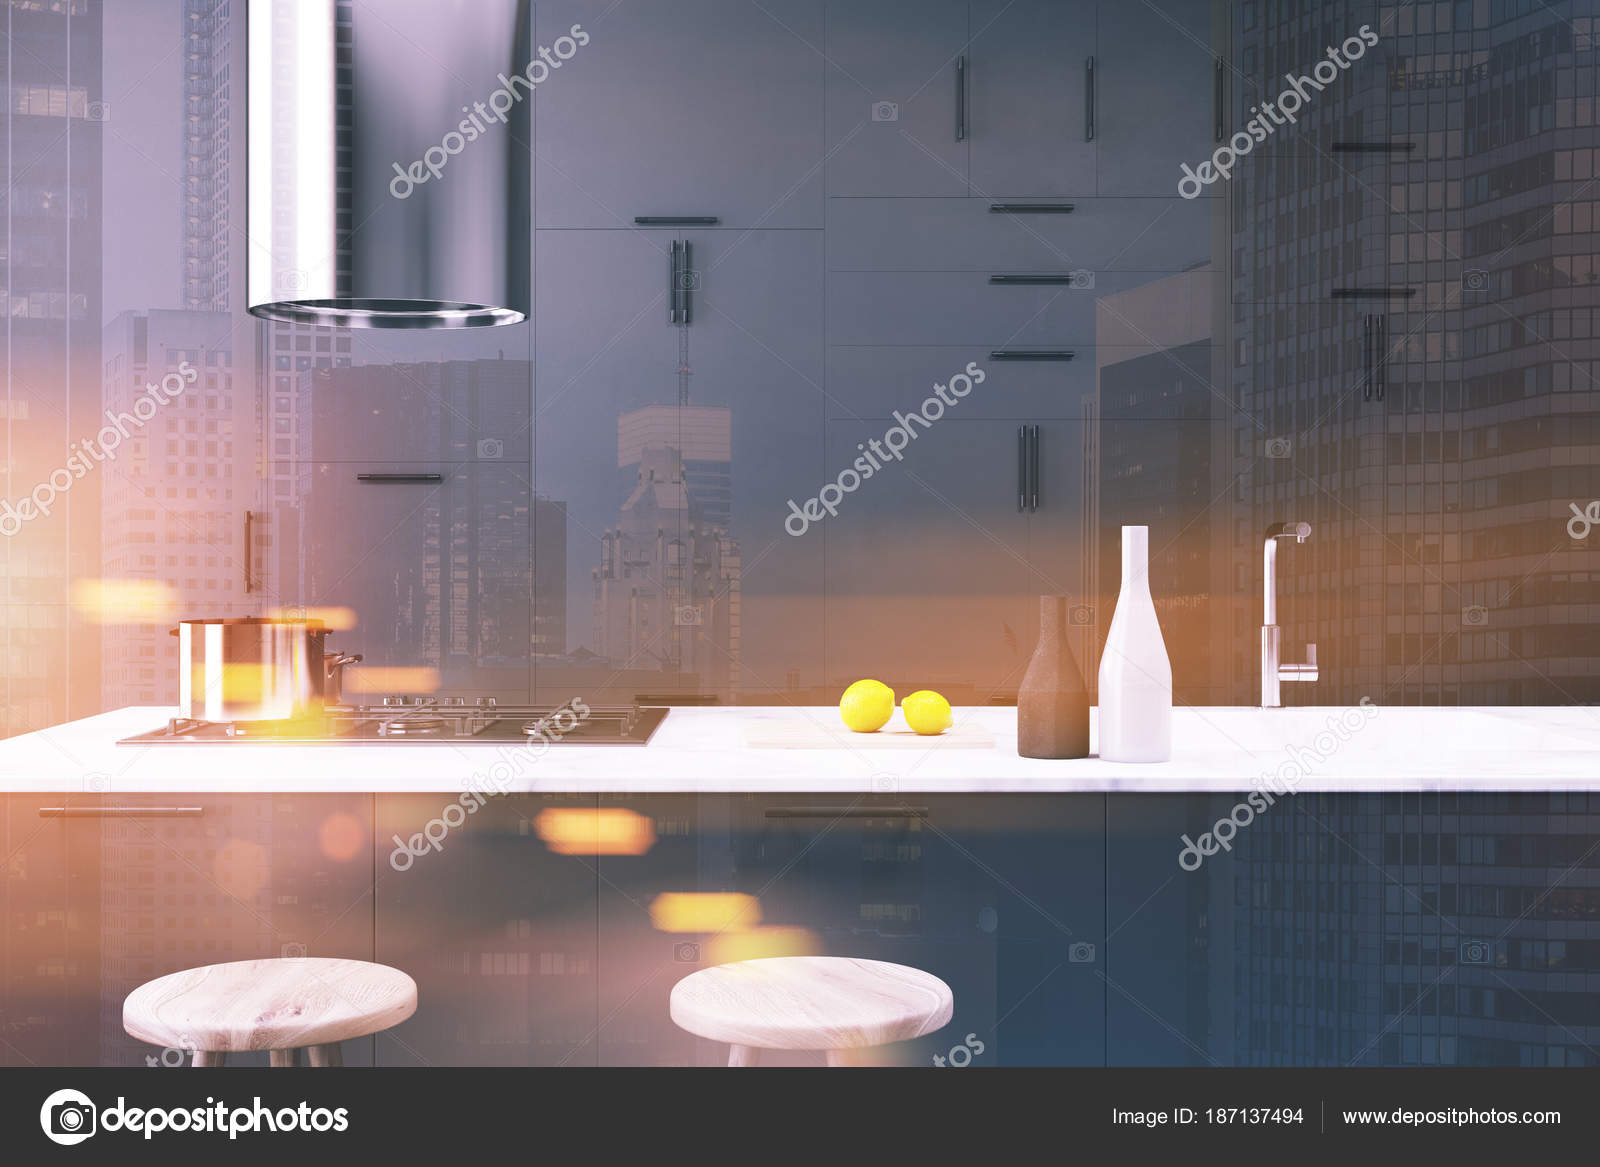 pub kitchen table corner cabinet 深灰色厨房内饰 酒吧关闭色调 图库照片 c denisismagilov 187137494